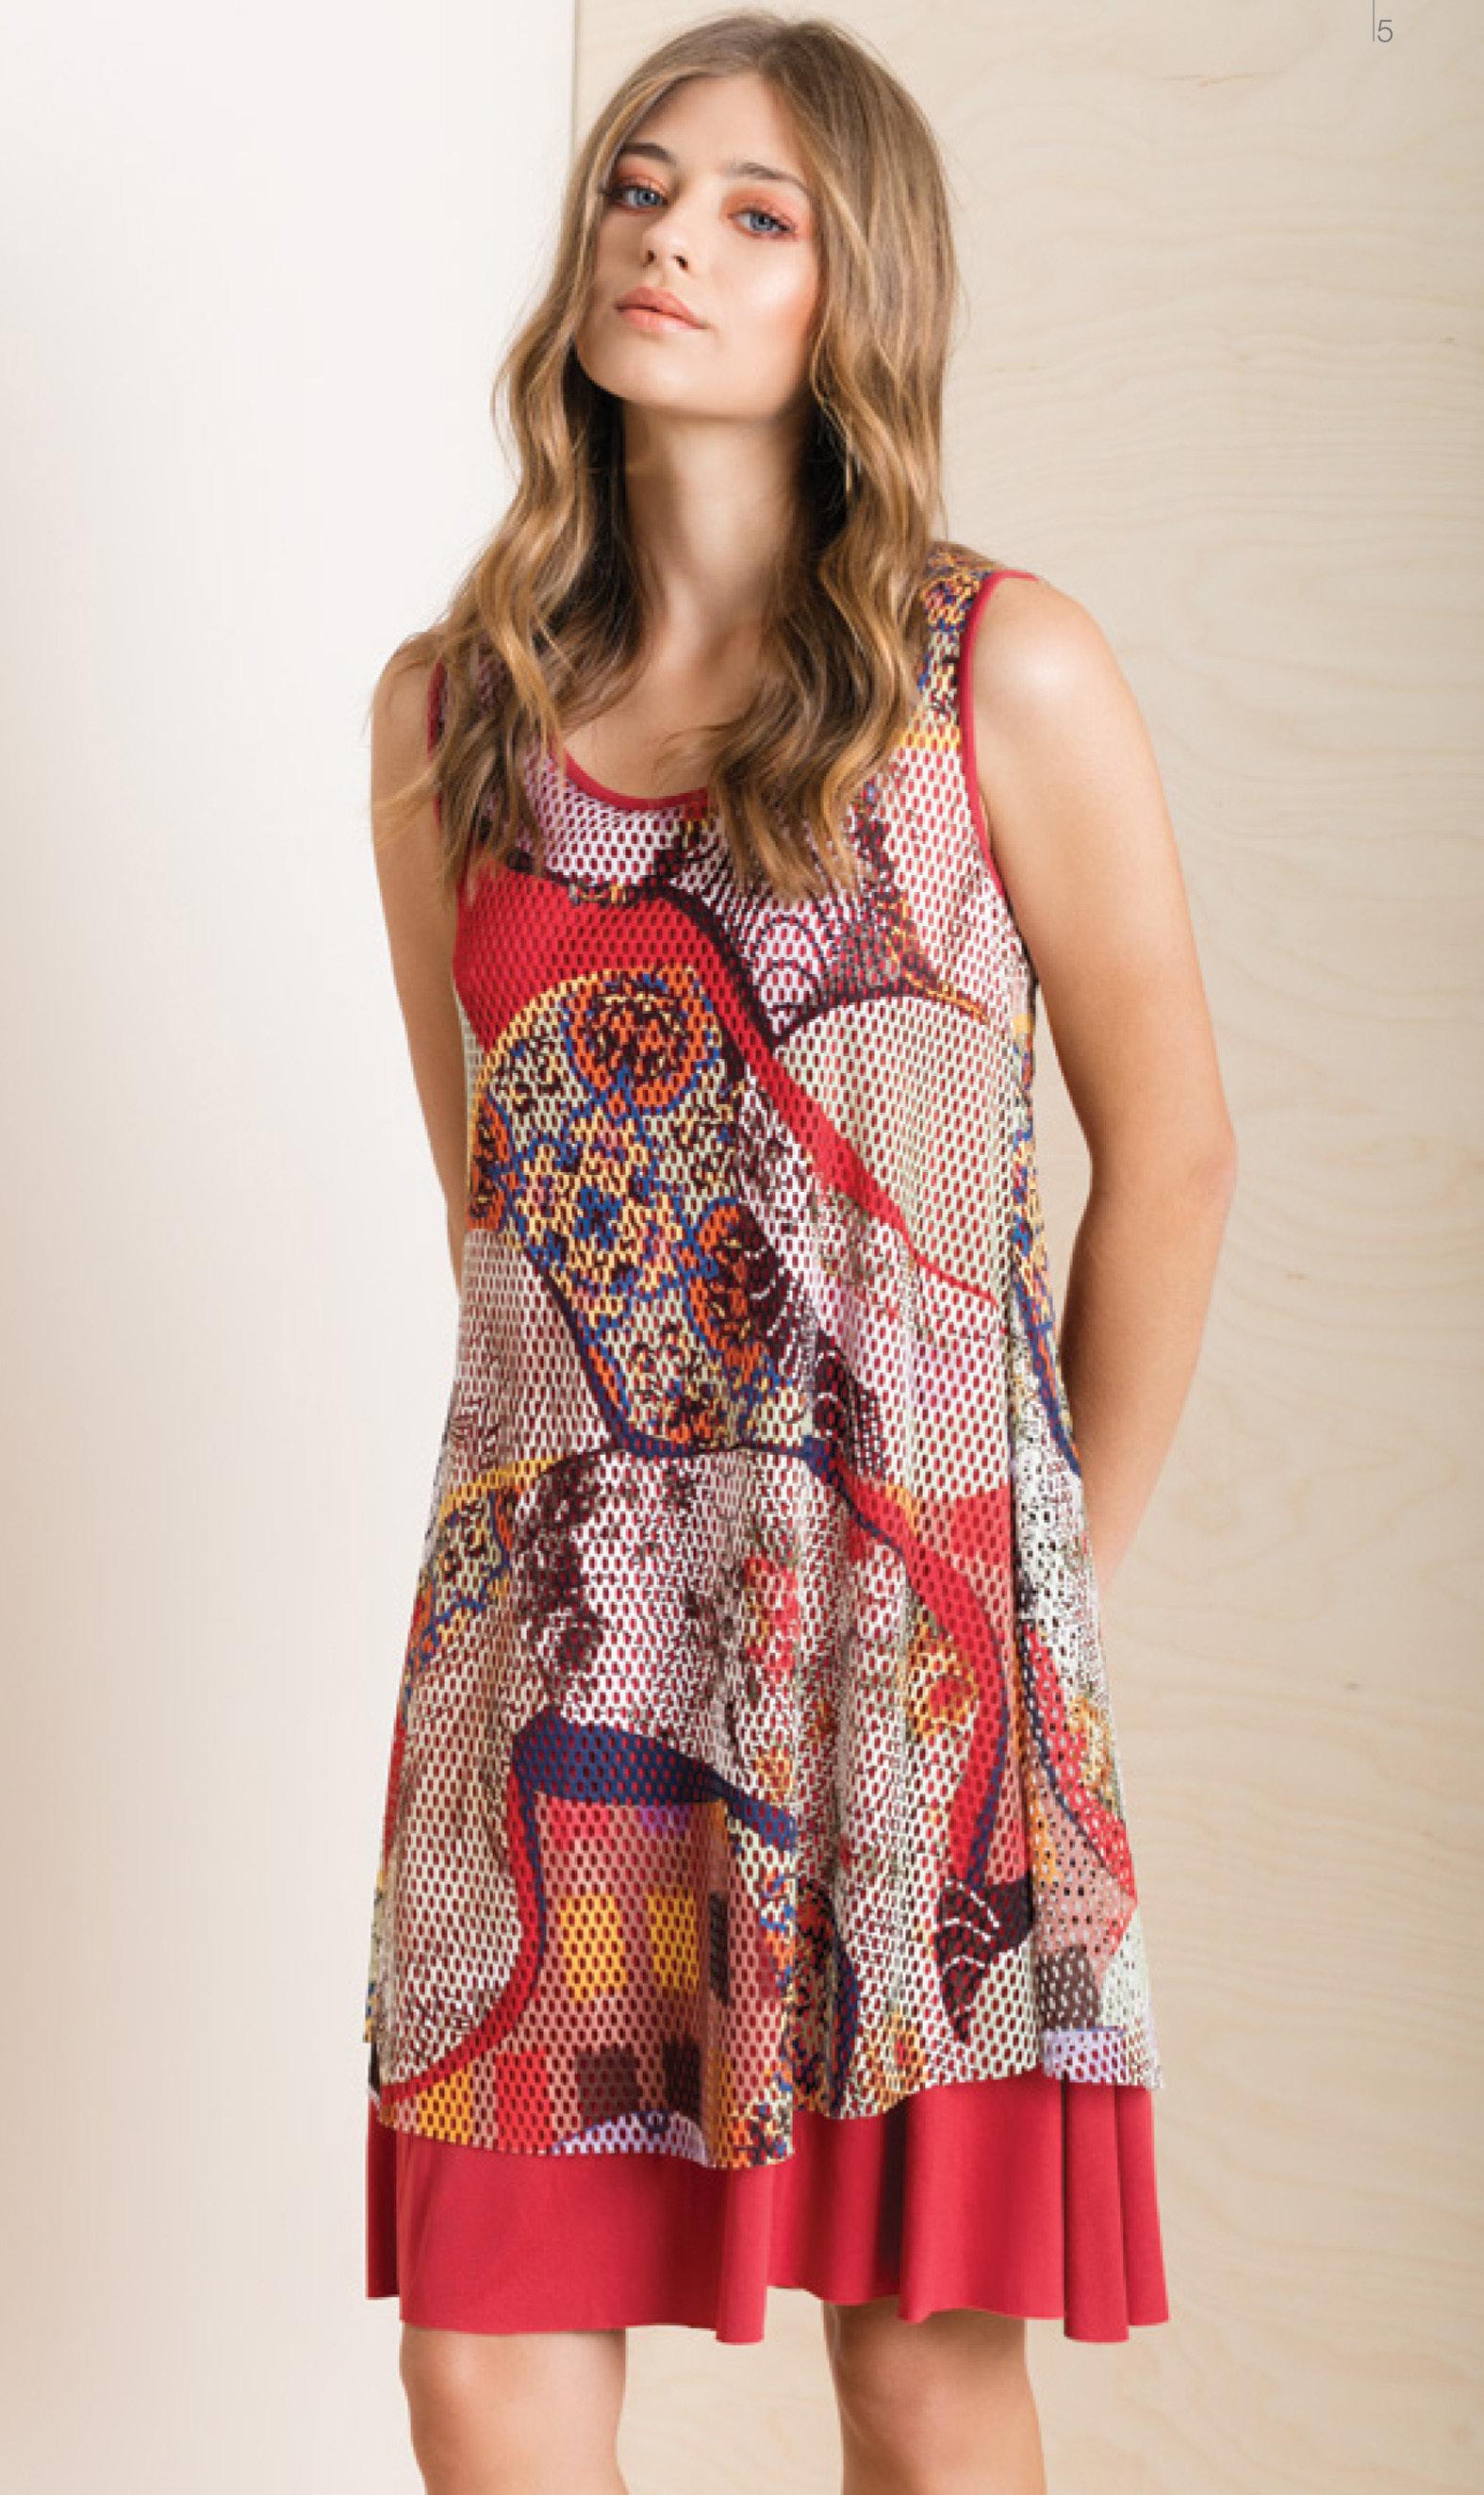 Maloka: Puzzle Pieces Abstract Art Midi Dress (2 Left!) MK_INAYA